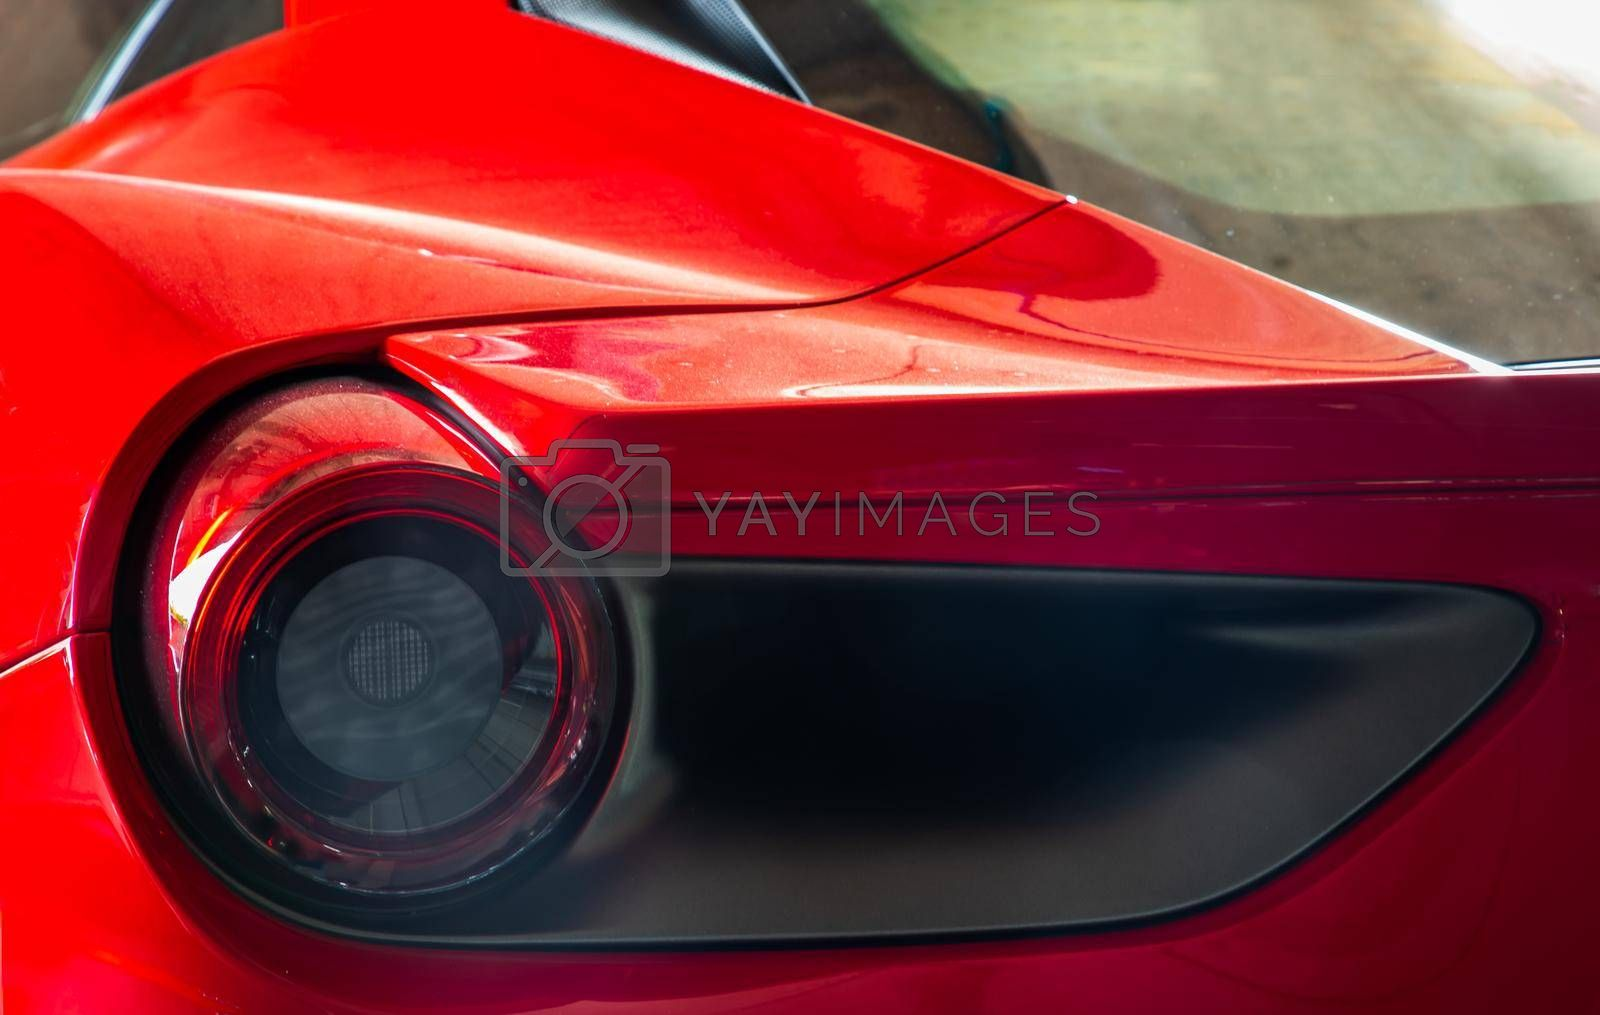 Bangkok, Thailand - 06 Jun 2021 : Close-up of Rear light or Tail lamp and Rim of Red ferrari car. Ferrari is Italian sports car. Selective focus.